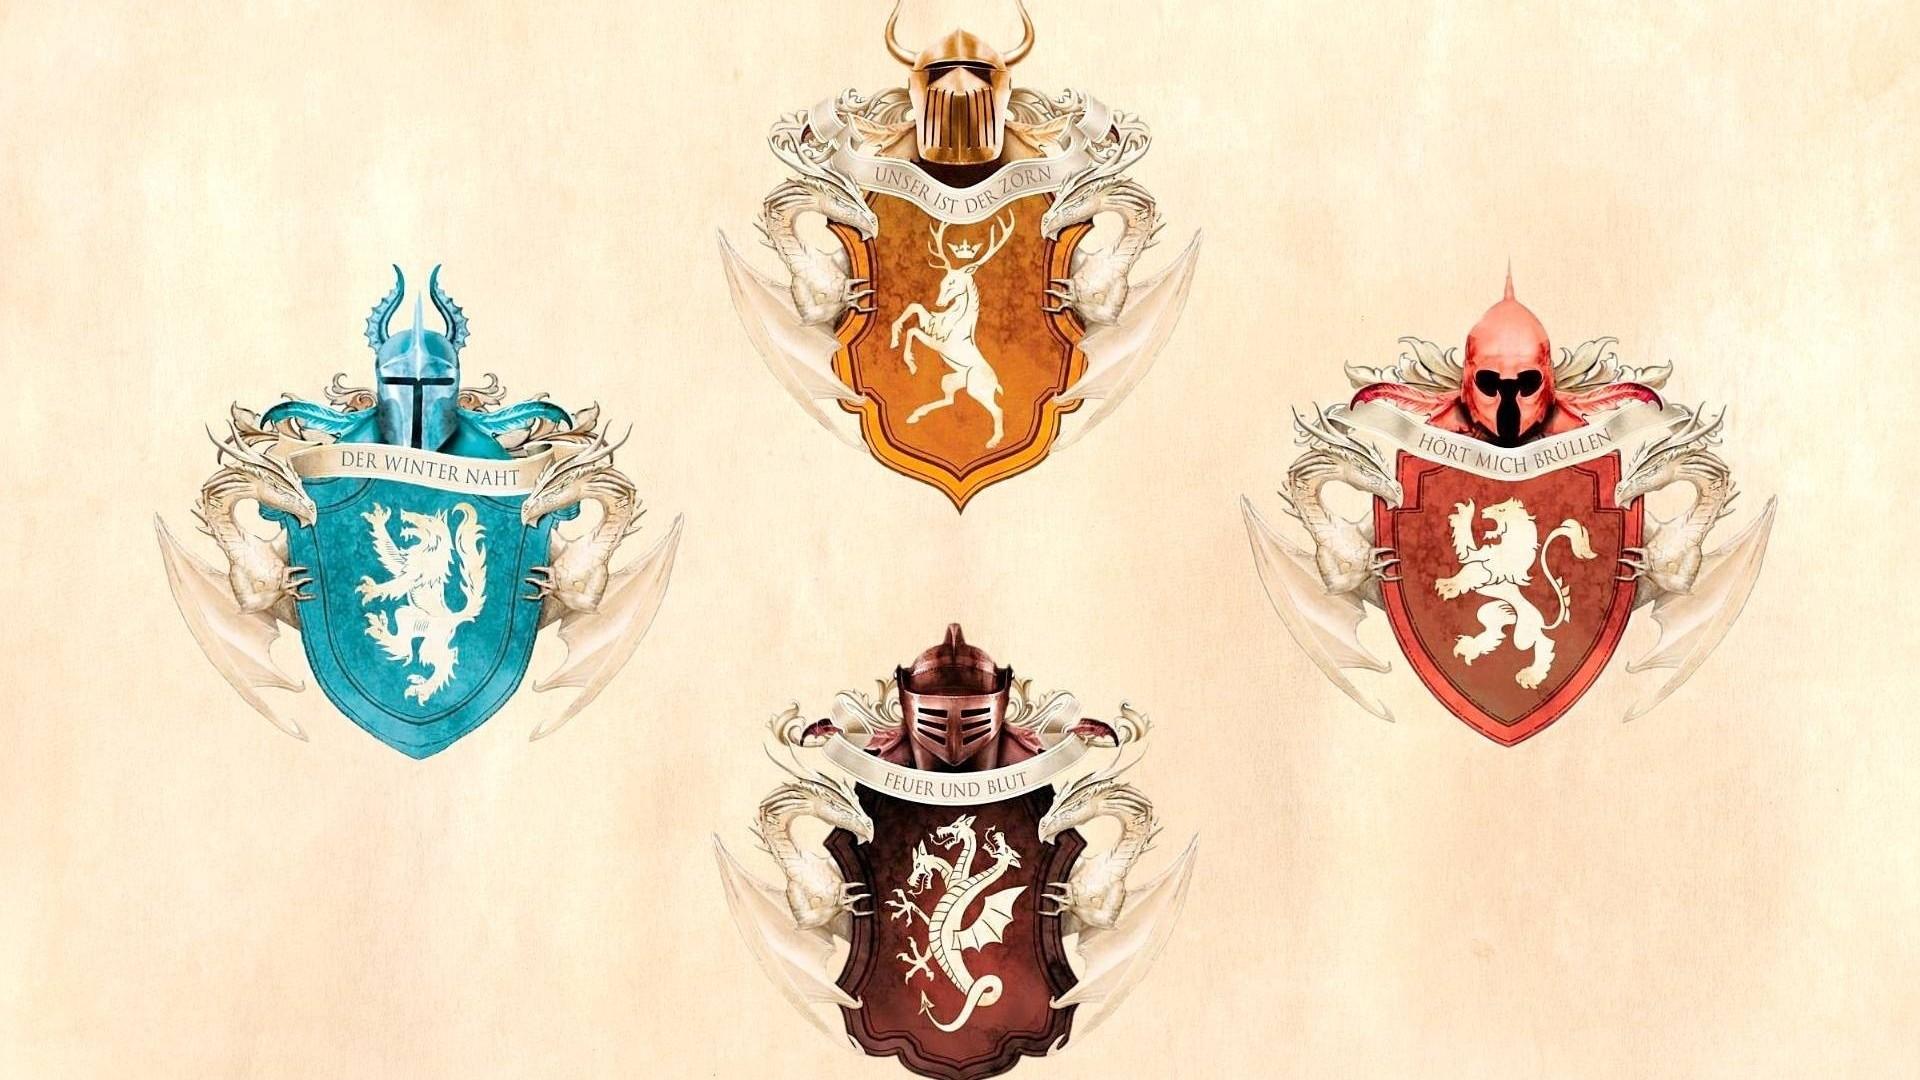 Preview wallpaper game of thrones, emblems, house stark, house targaryen,  house baratheon